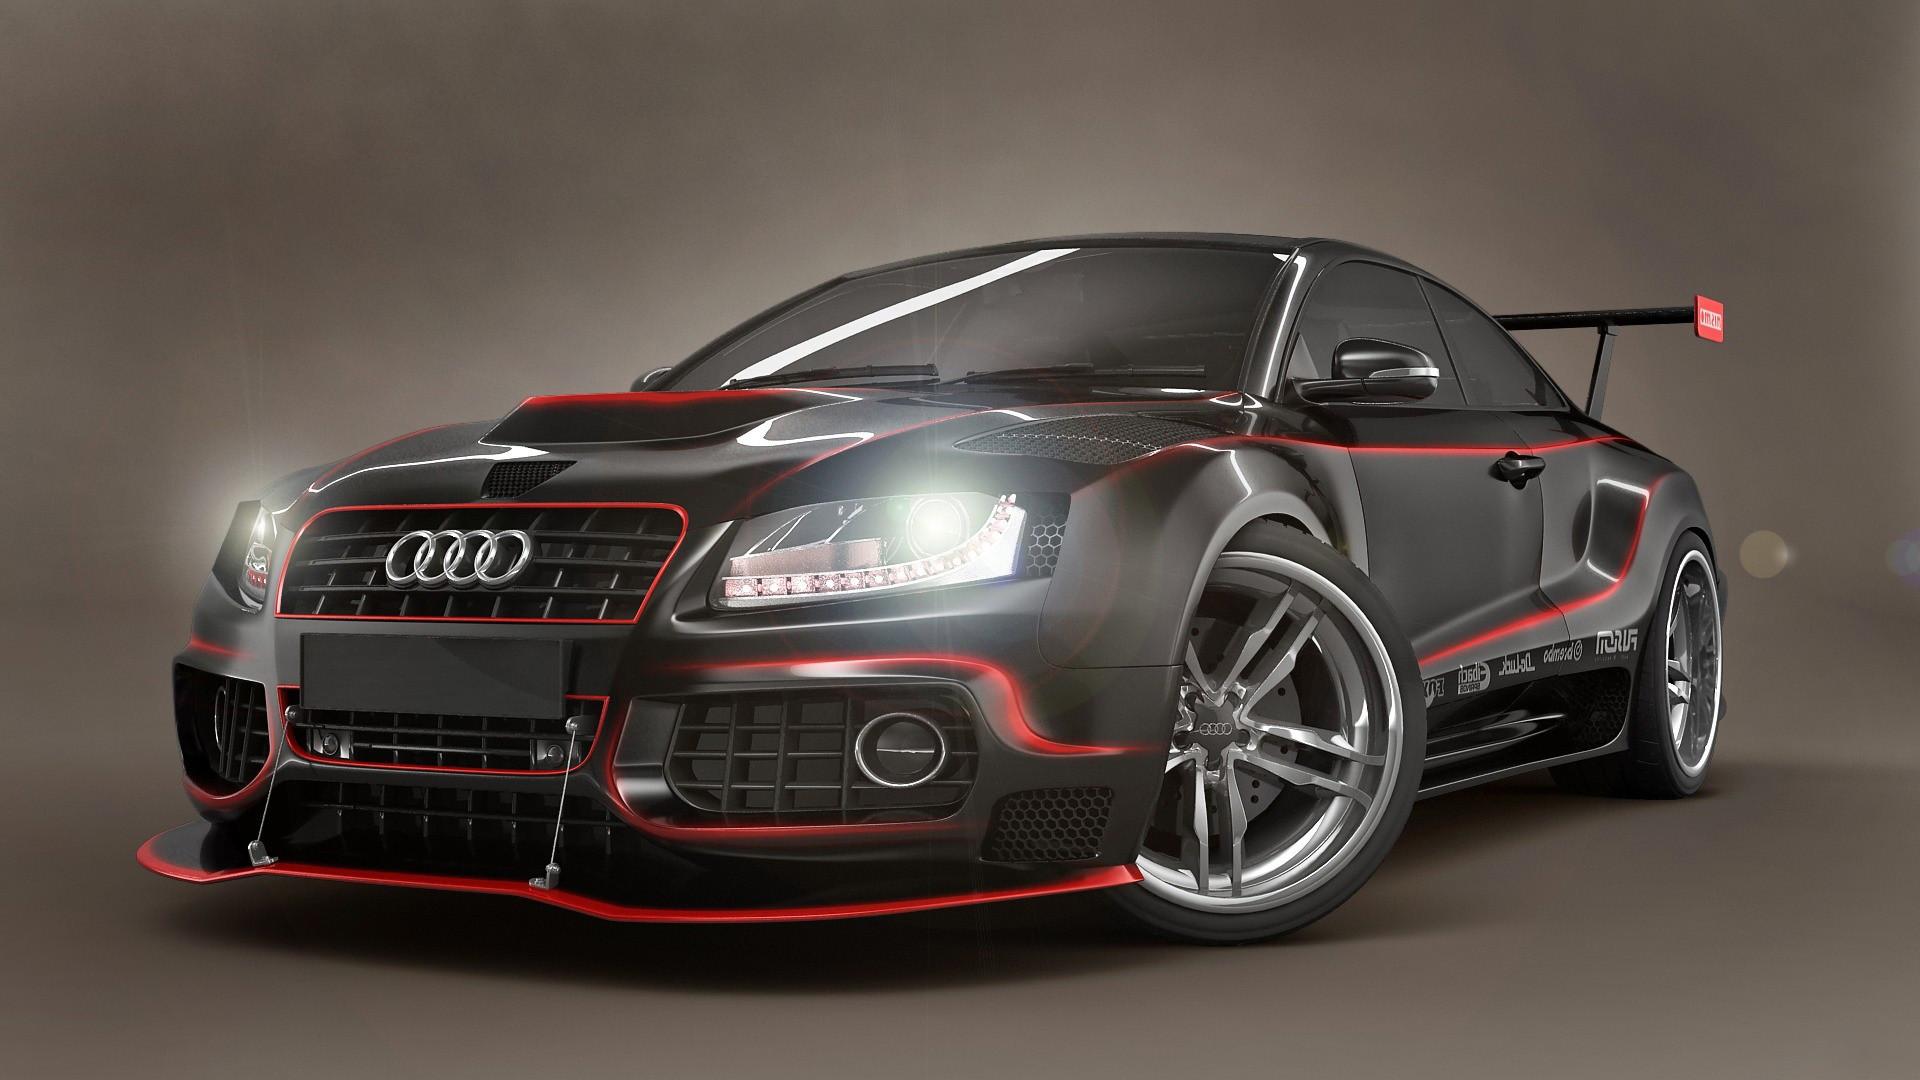 Audi Sport Car Windows 10 Wallpaper